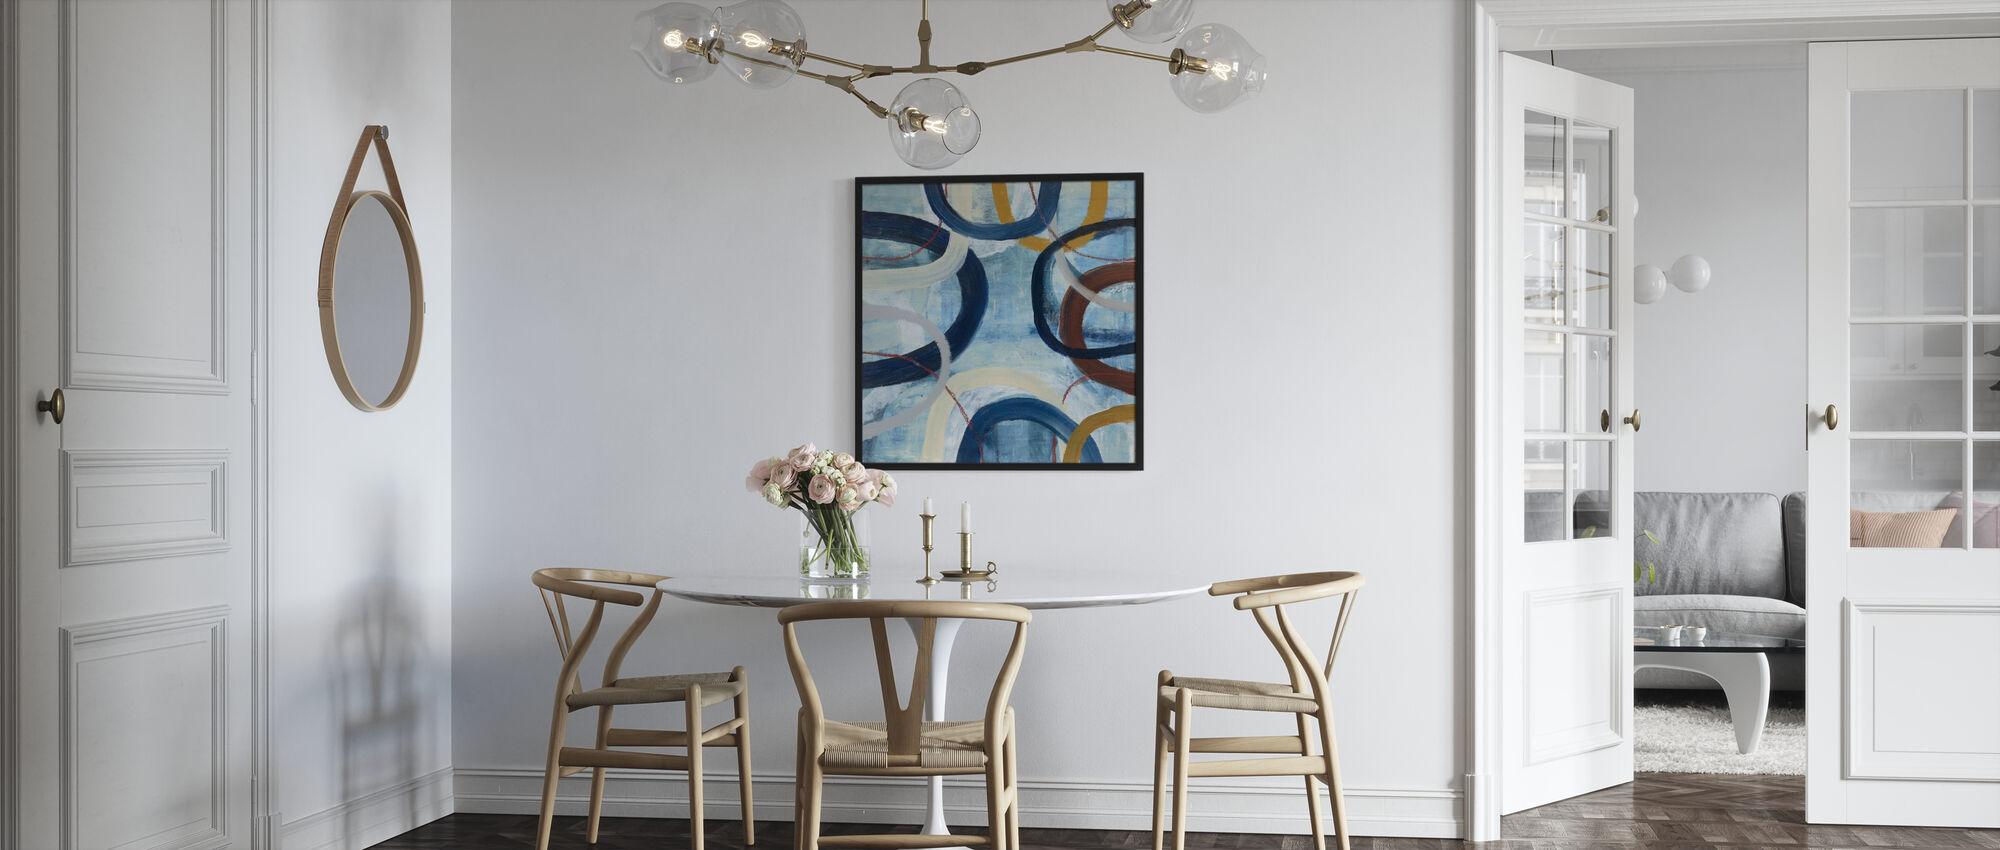 Dwell 2 - Framed print - Kitchen